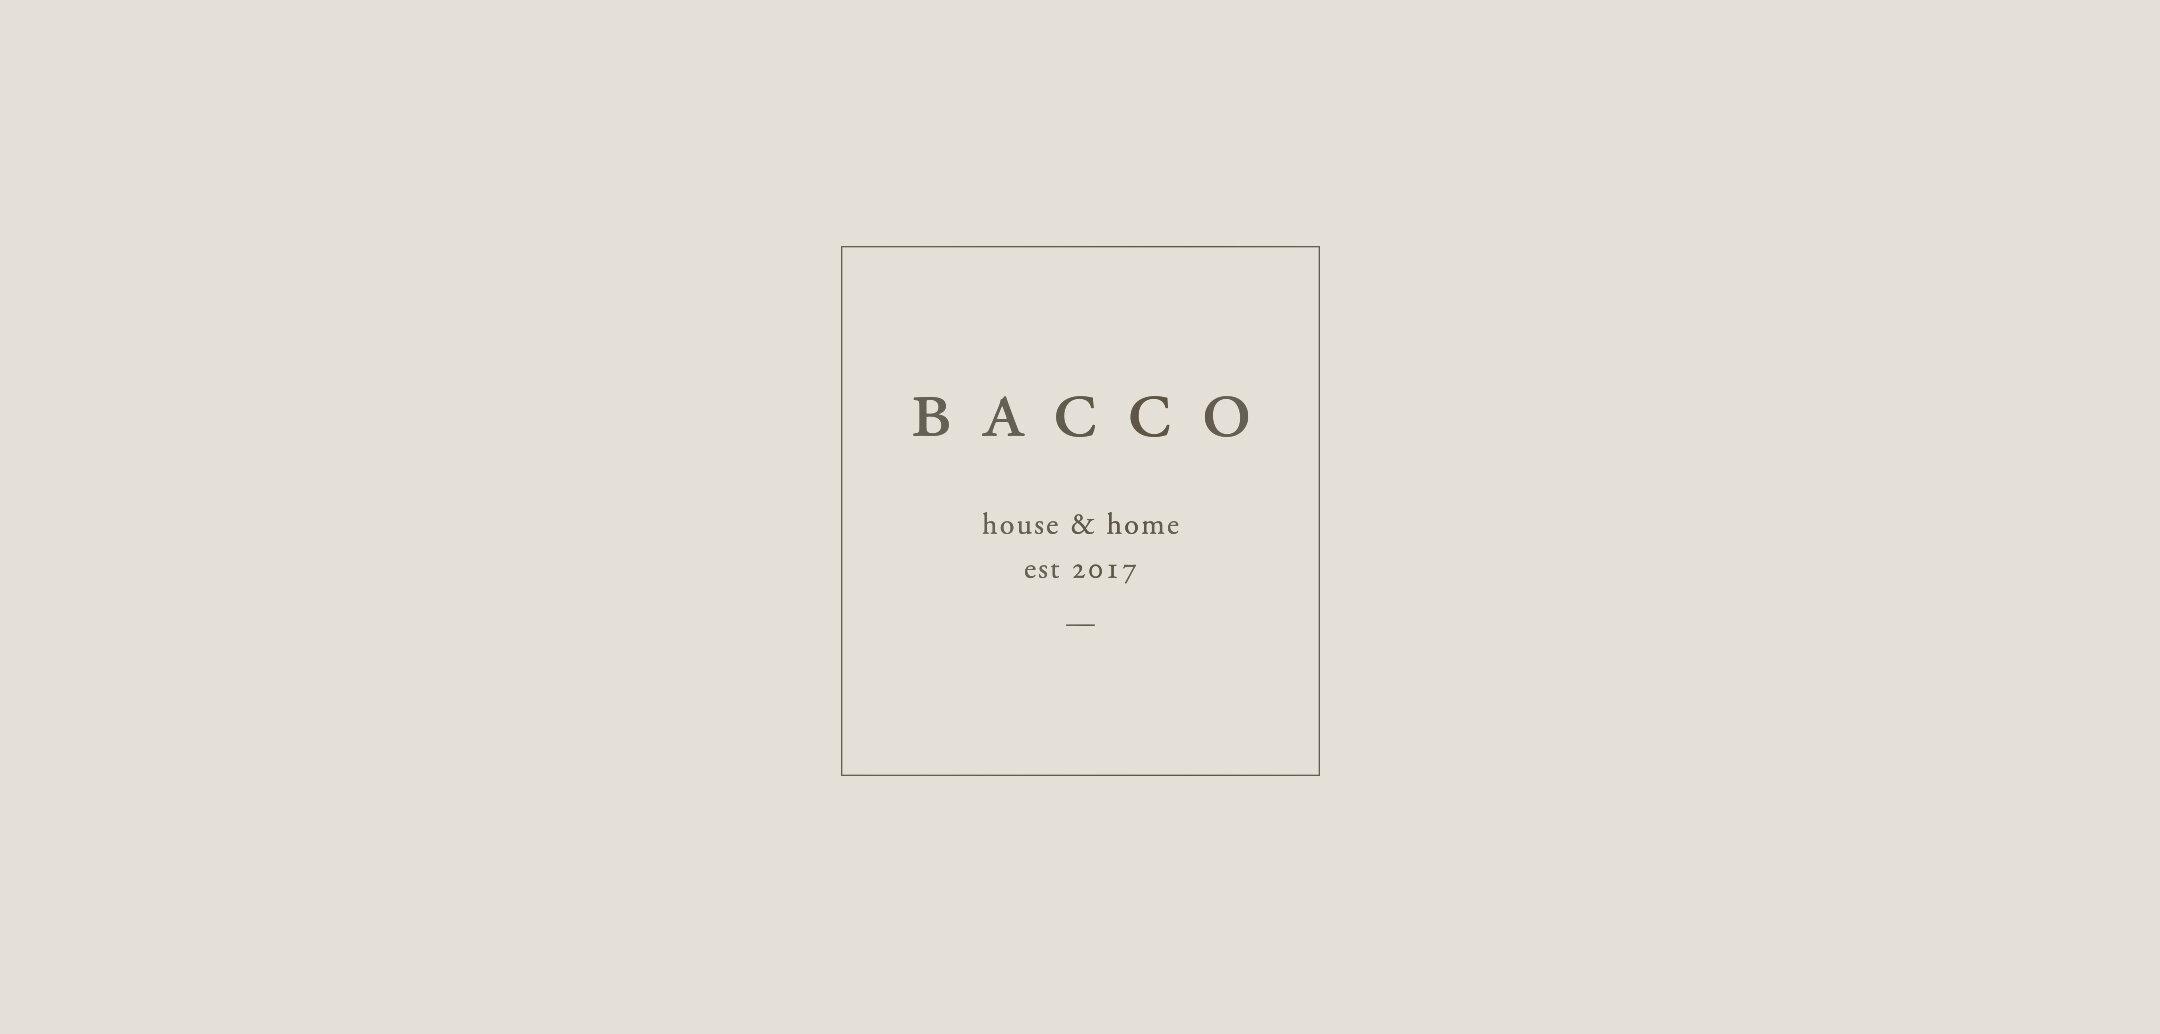 Banner_Logos_Bacco.jpg